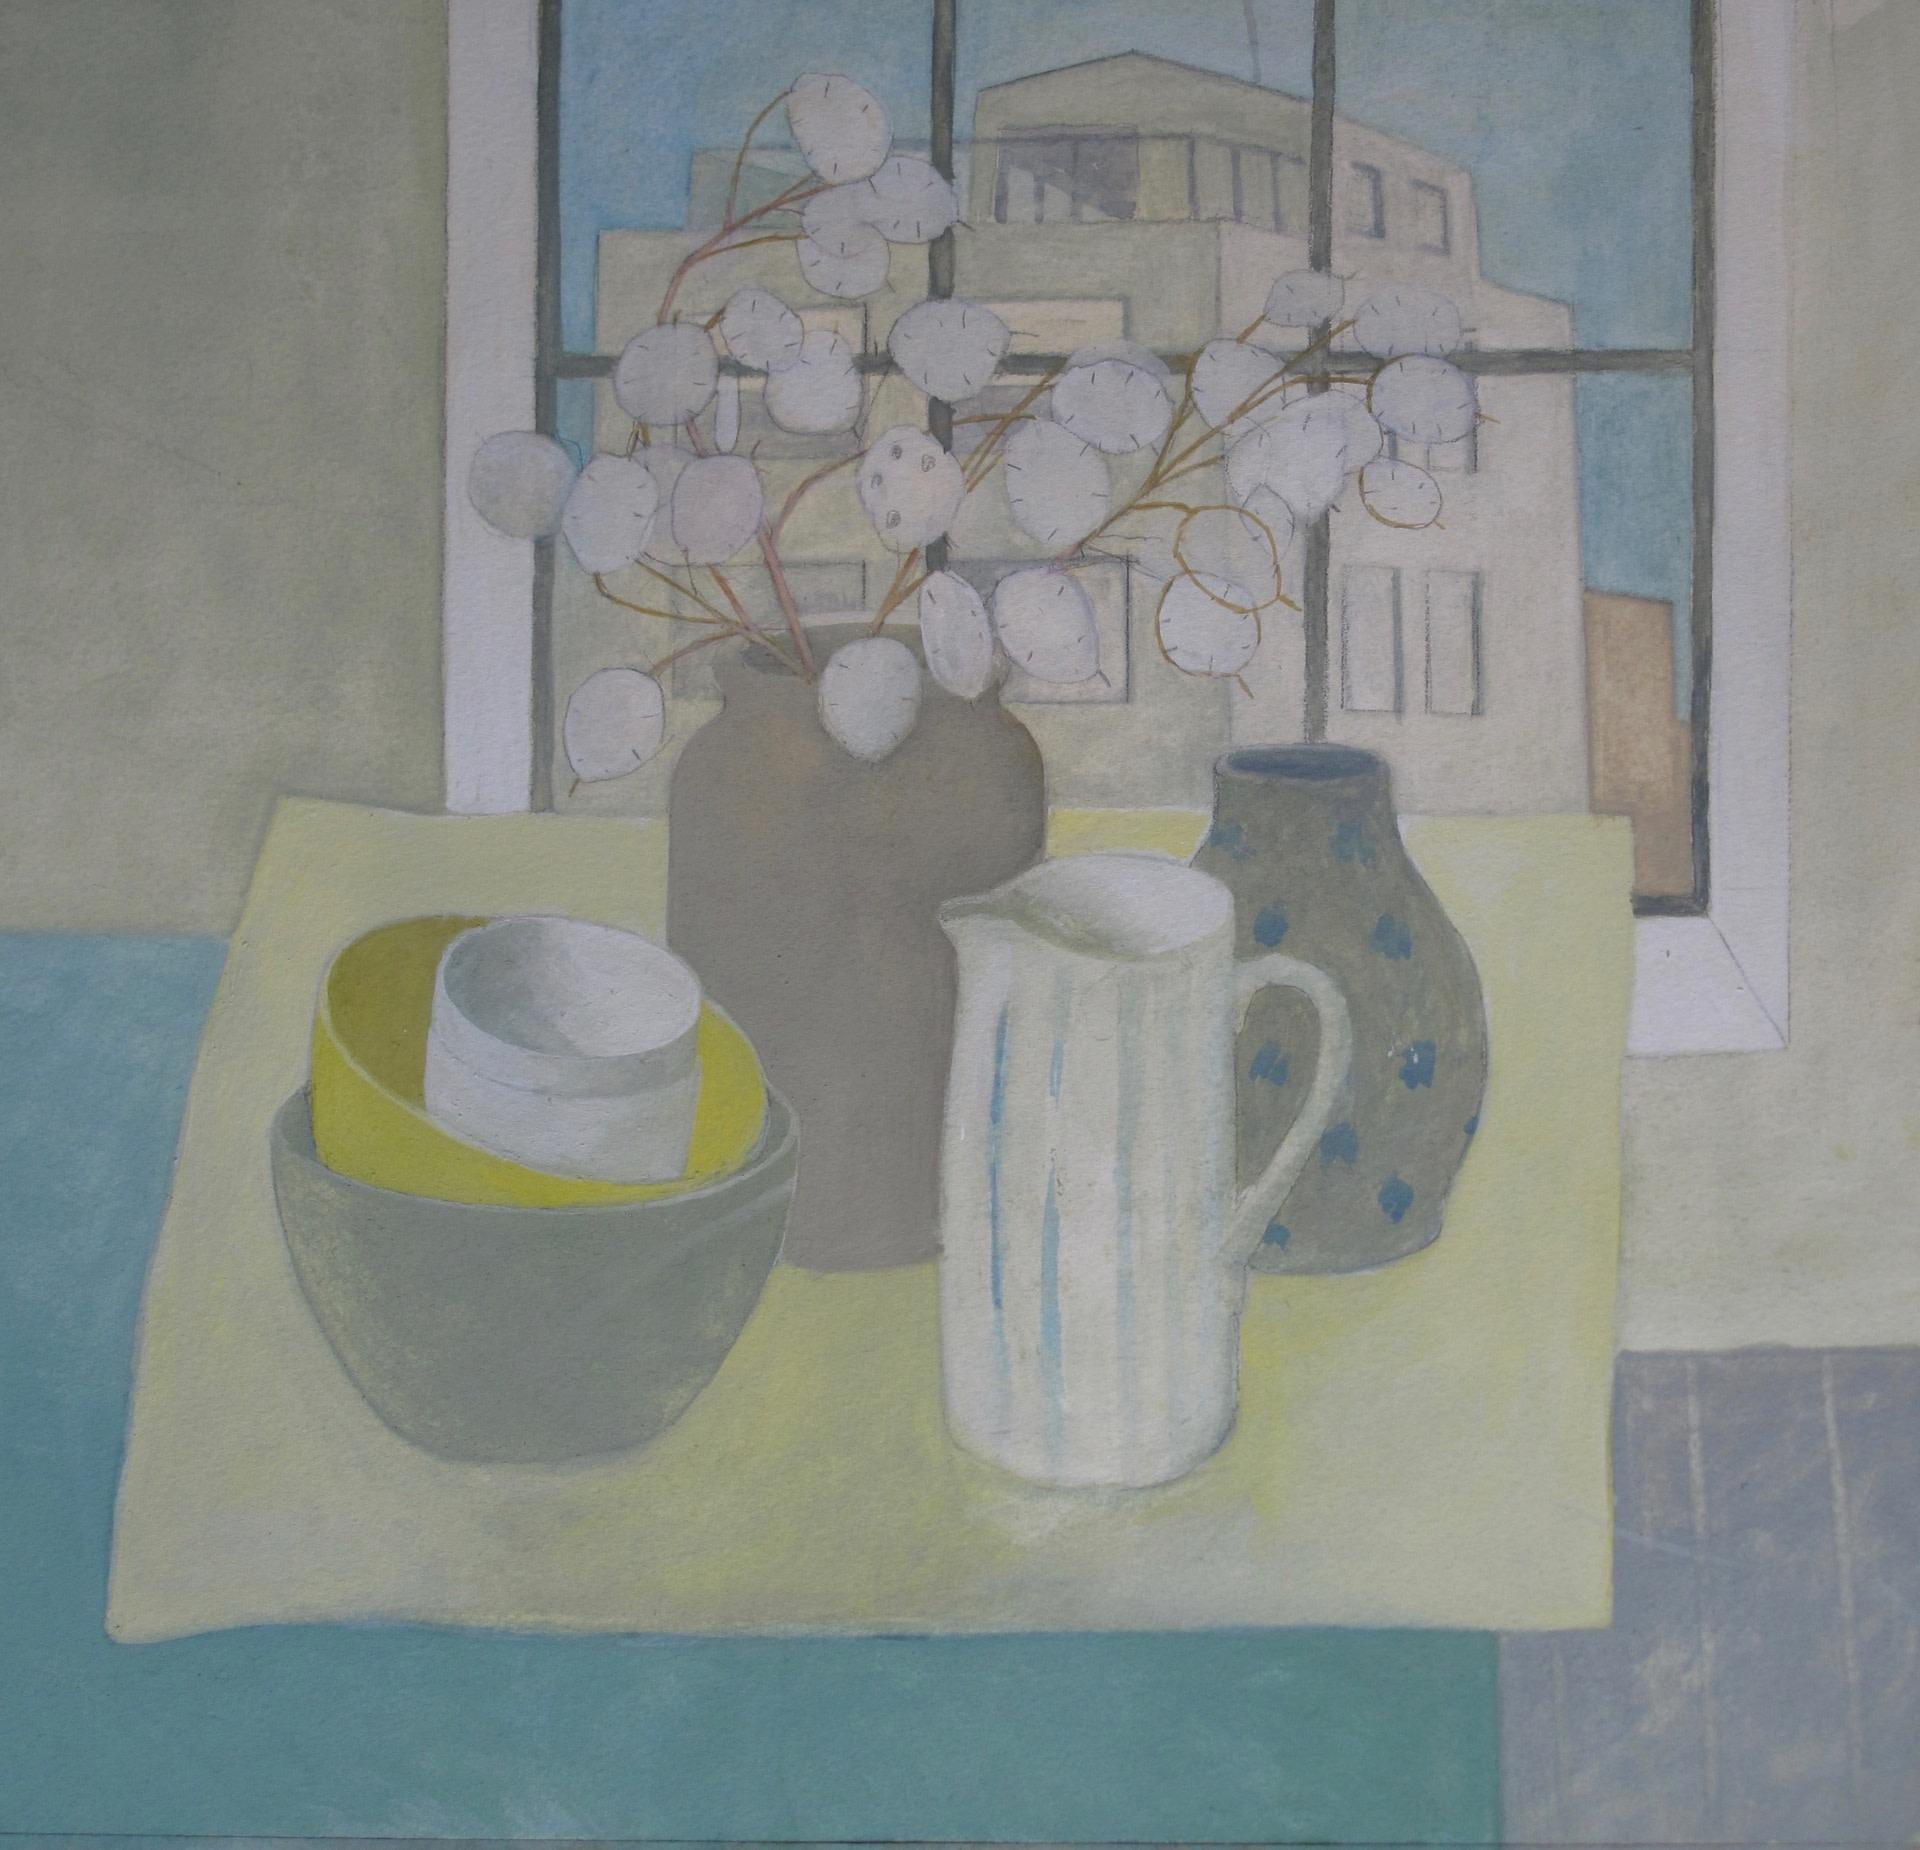 <span class=&#34;link fancybox-details-link&#34;><a href=&#34;/exhibitions/24/works/artworks_standalone10723/&#34;>View Detail Page</a></span><div class=&#34;artist&#34;><span class=&#34;artist&#34;><strong>Wendy Jacob</strong></span></div><div class=&#34;title&#34;><em>Still Life on a Blue Table</em></div><div class=&#34;medium&#34;>gouache</div><div class=&#34;dimensions&#34;>53x53cm</div>